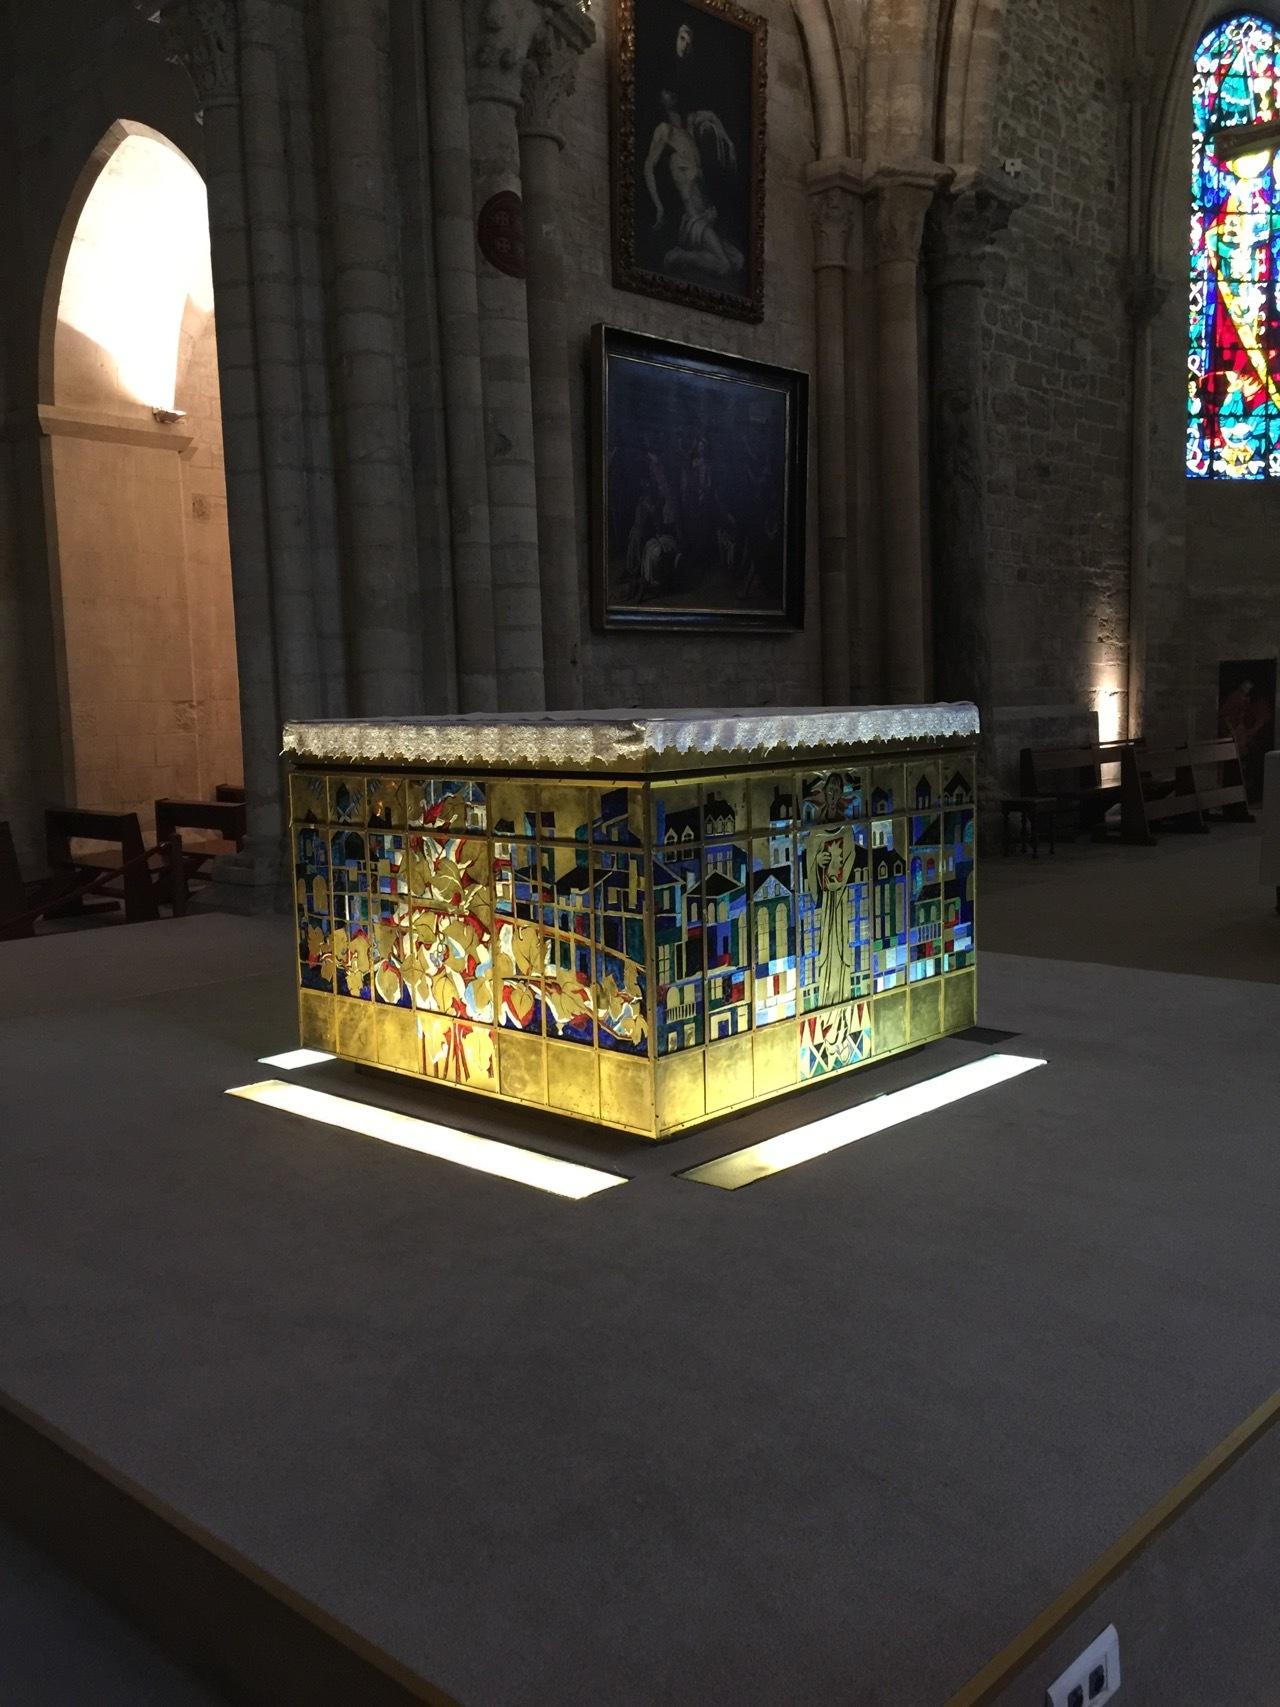 Altare by Claudio Raspollini